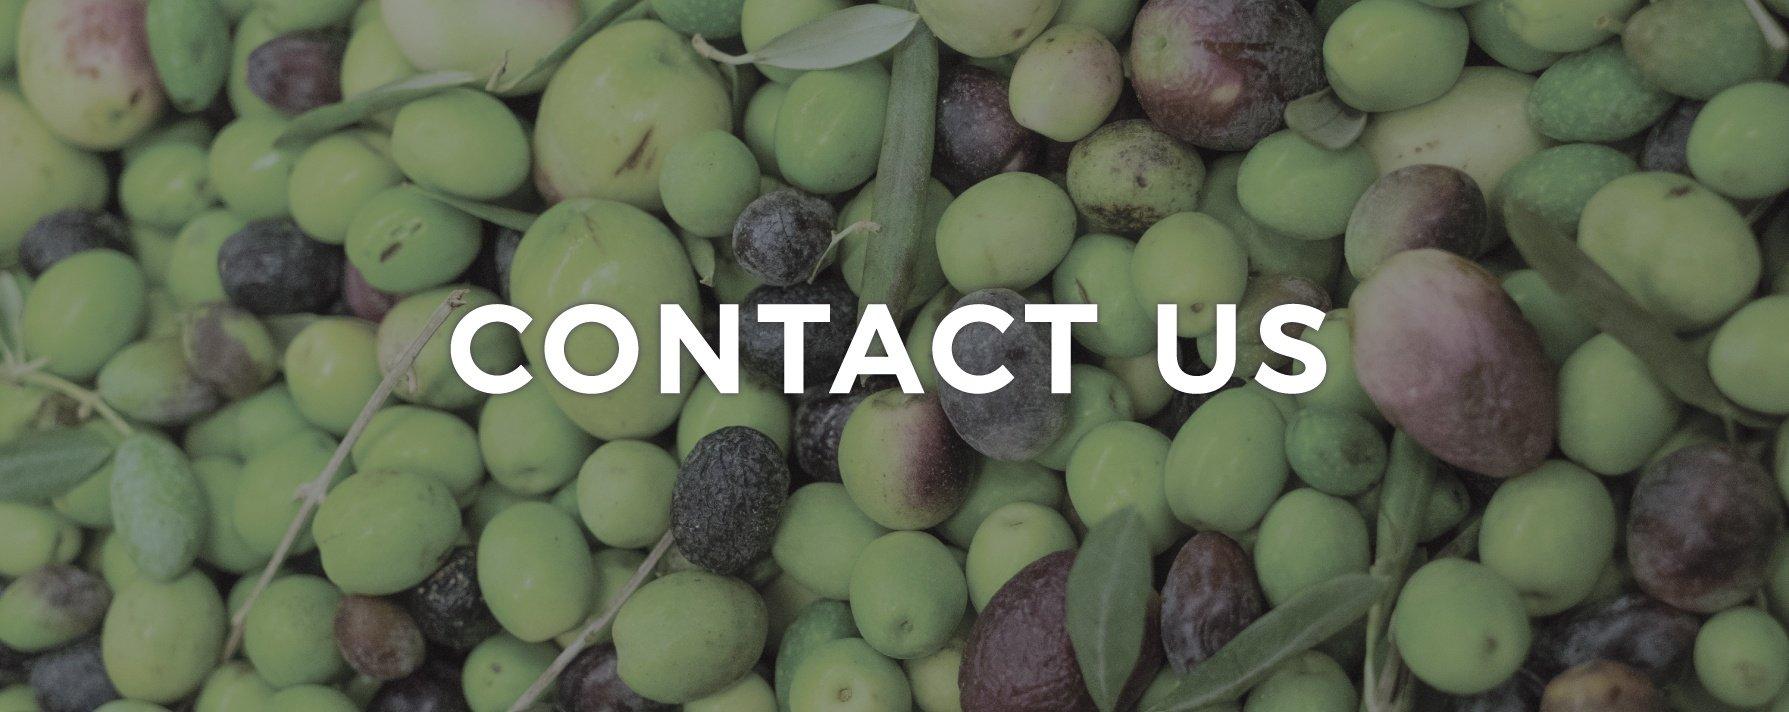 1789x712-Contact-Us-IMG.jpg